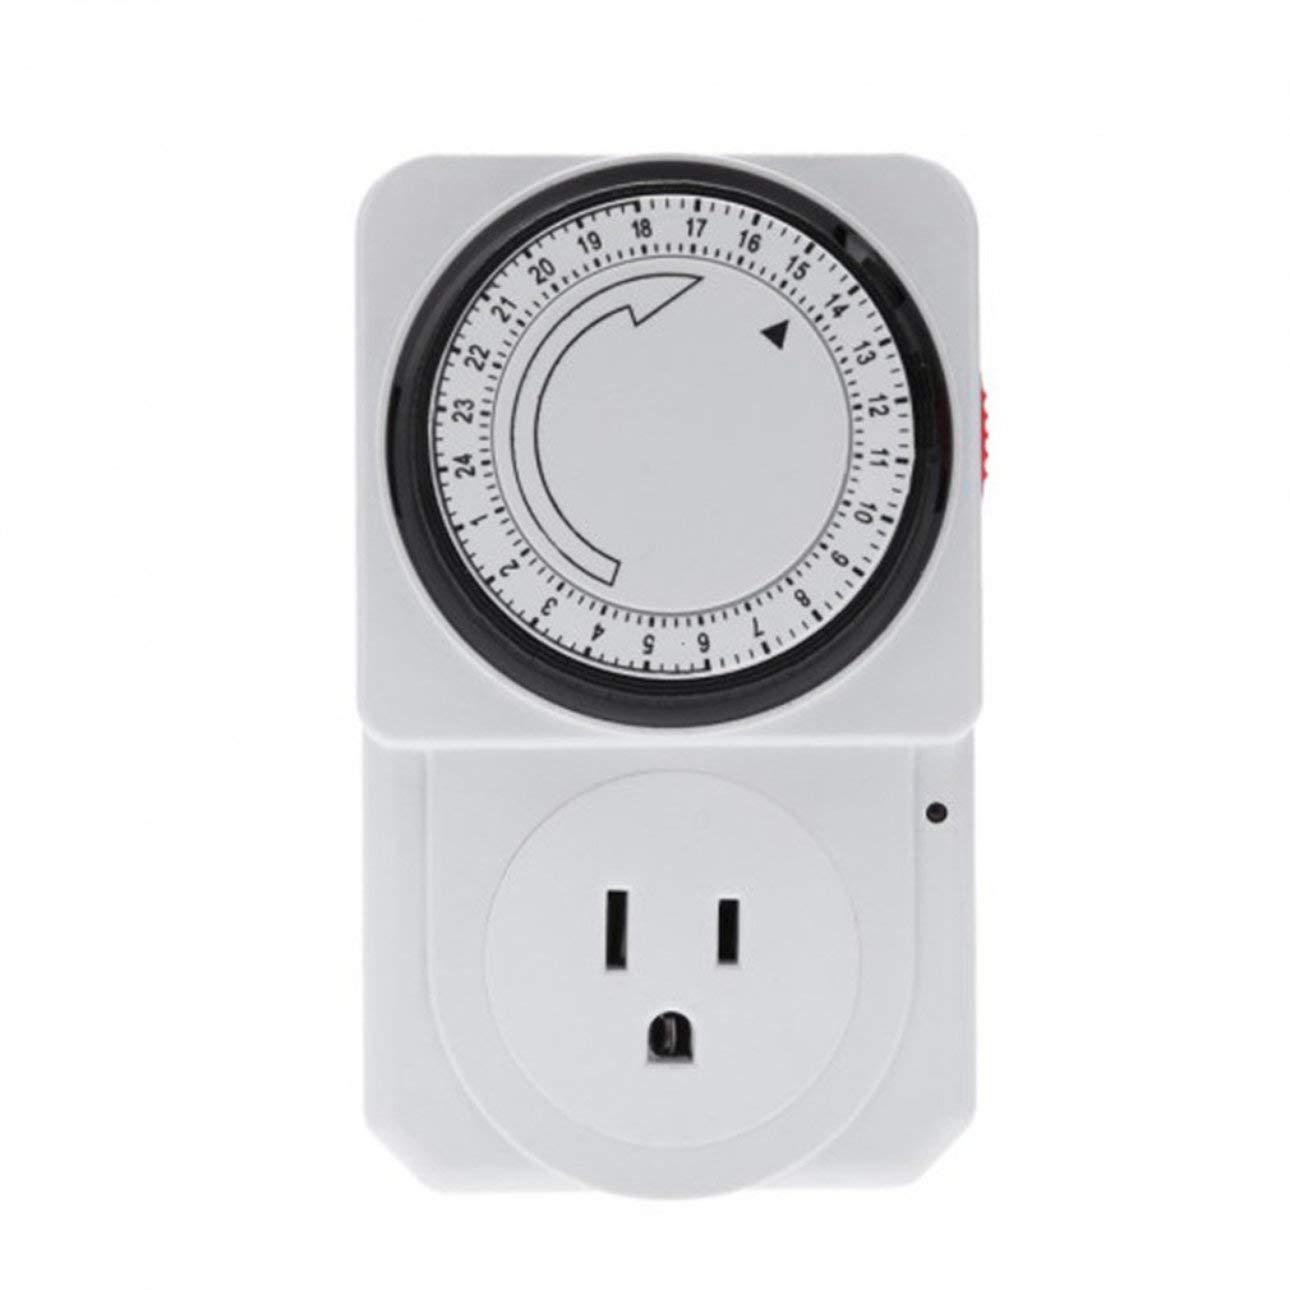 Liobaba 24 Hour Mechanical Electrical Plug Program Timer Power Switch Socket Energy Saver US Plug White Color